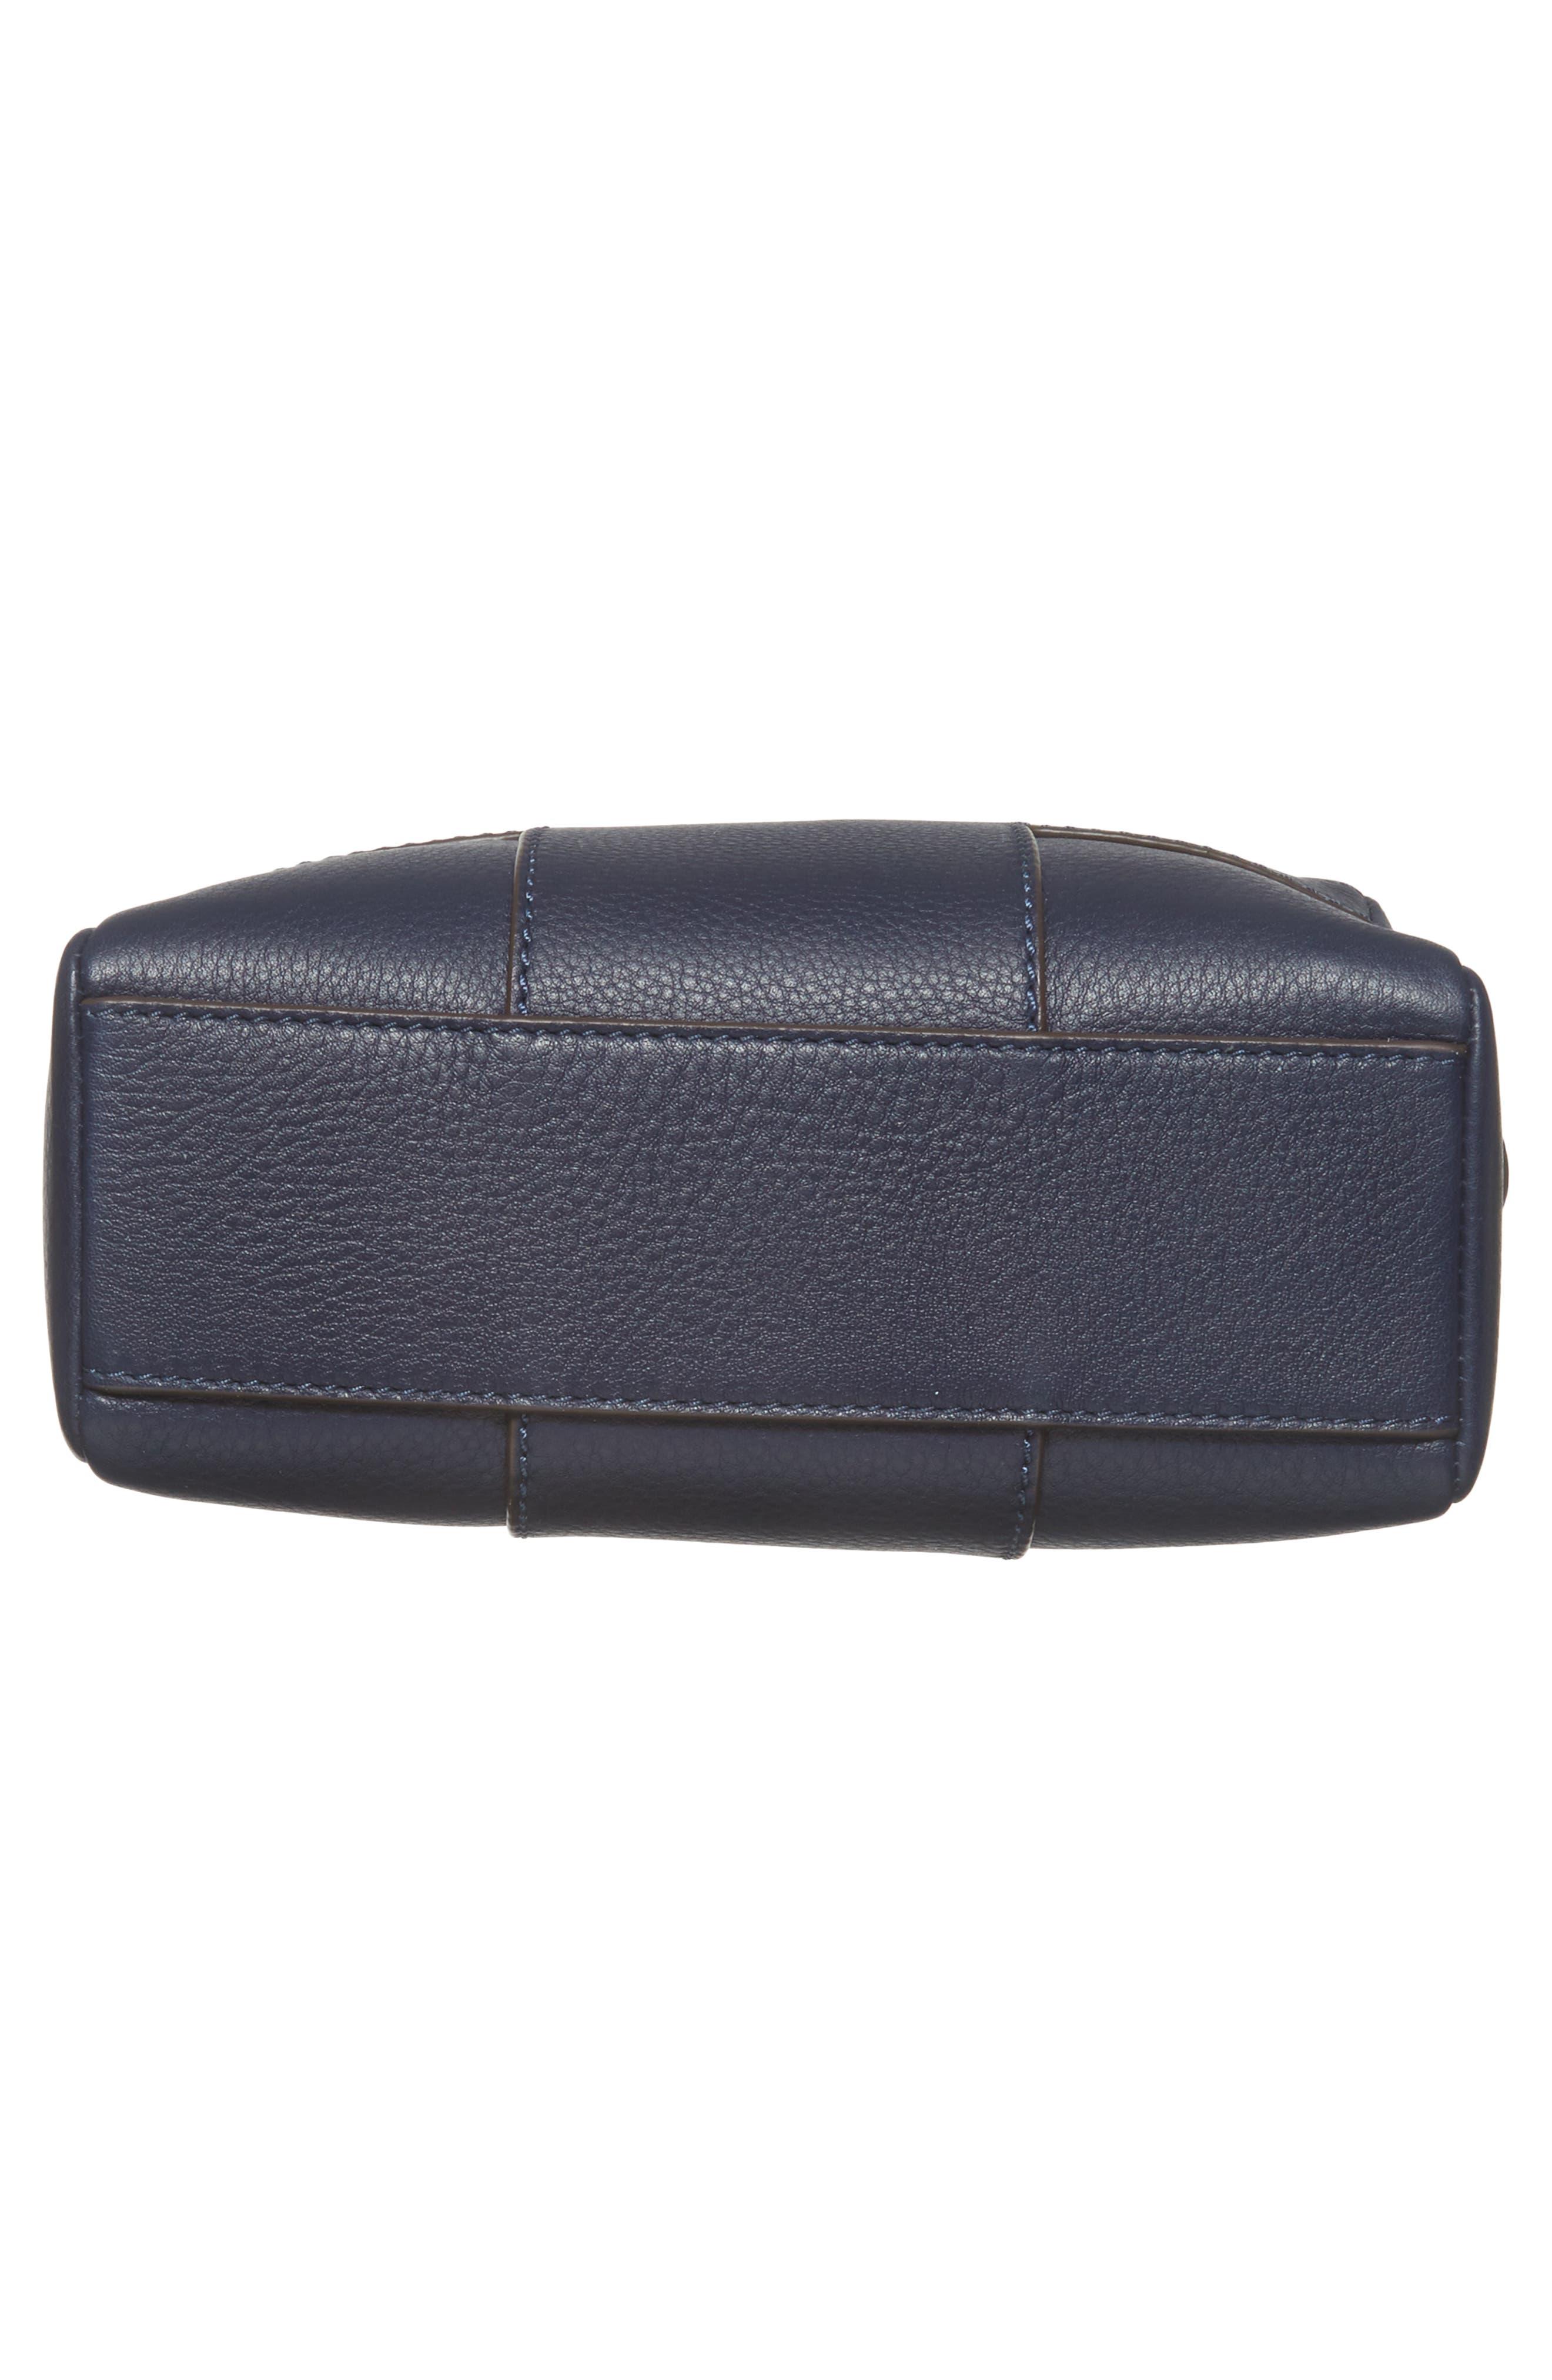 Block-T Double Zip Leather Crossbody Bag,                             Alternate thumbnail 12, color,